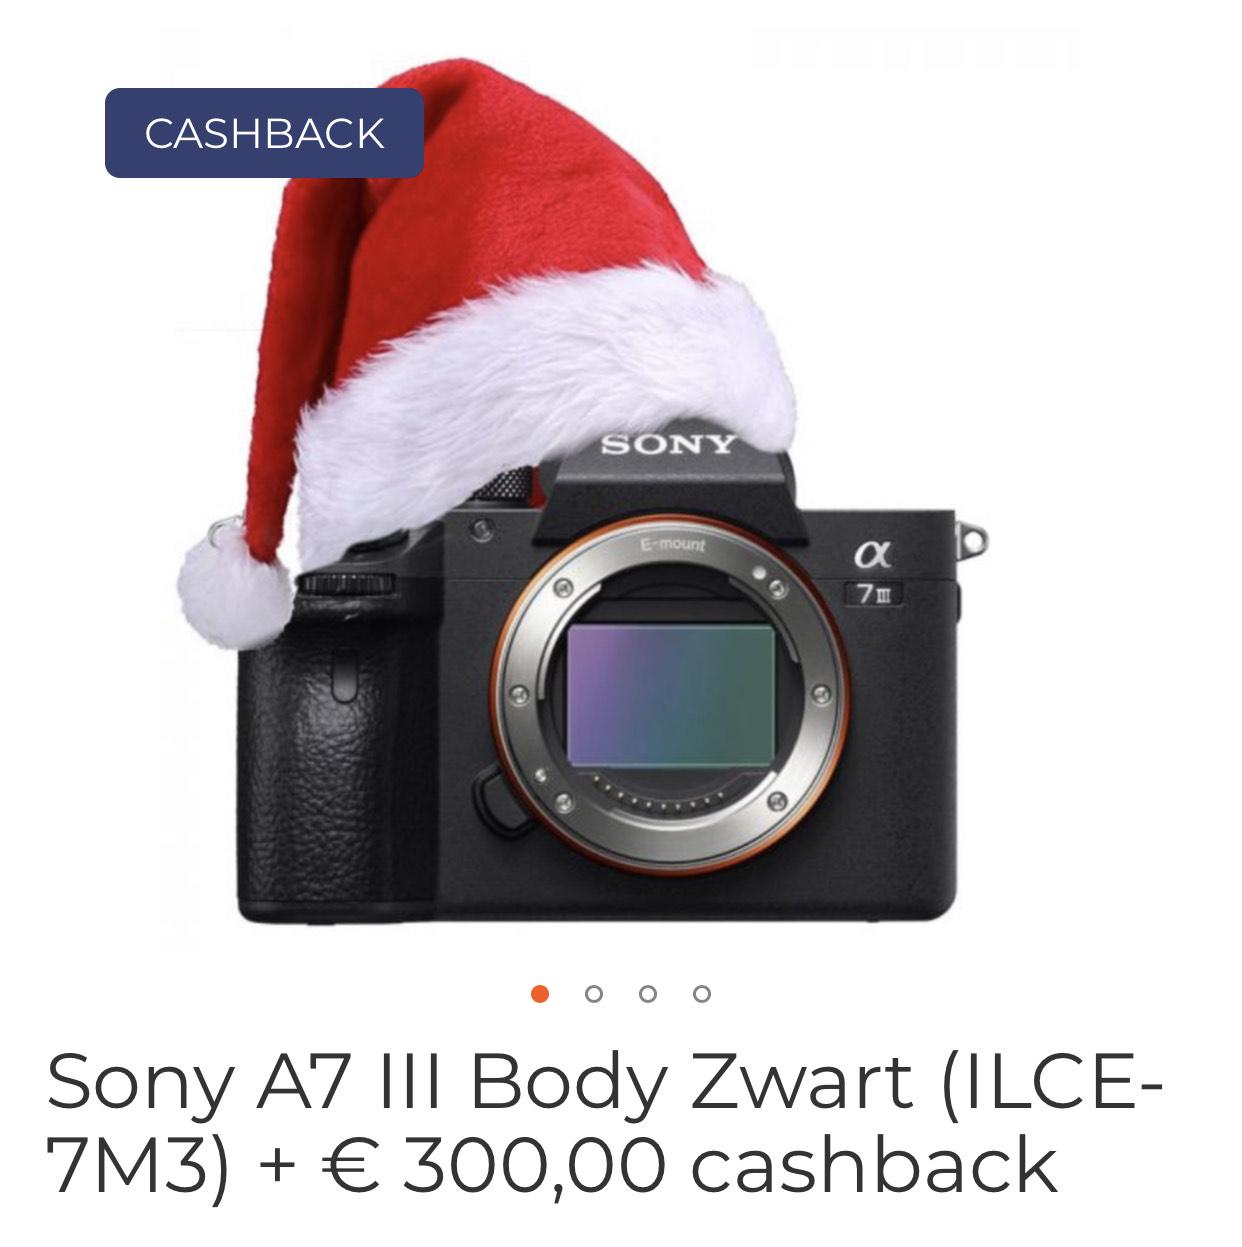 Sony A7 III body (1549€ na cashback)